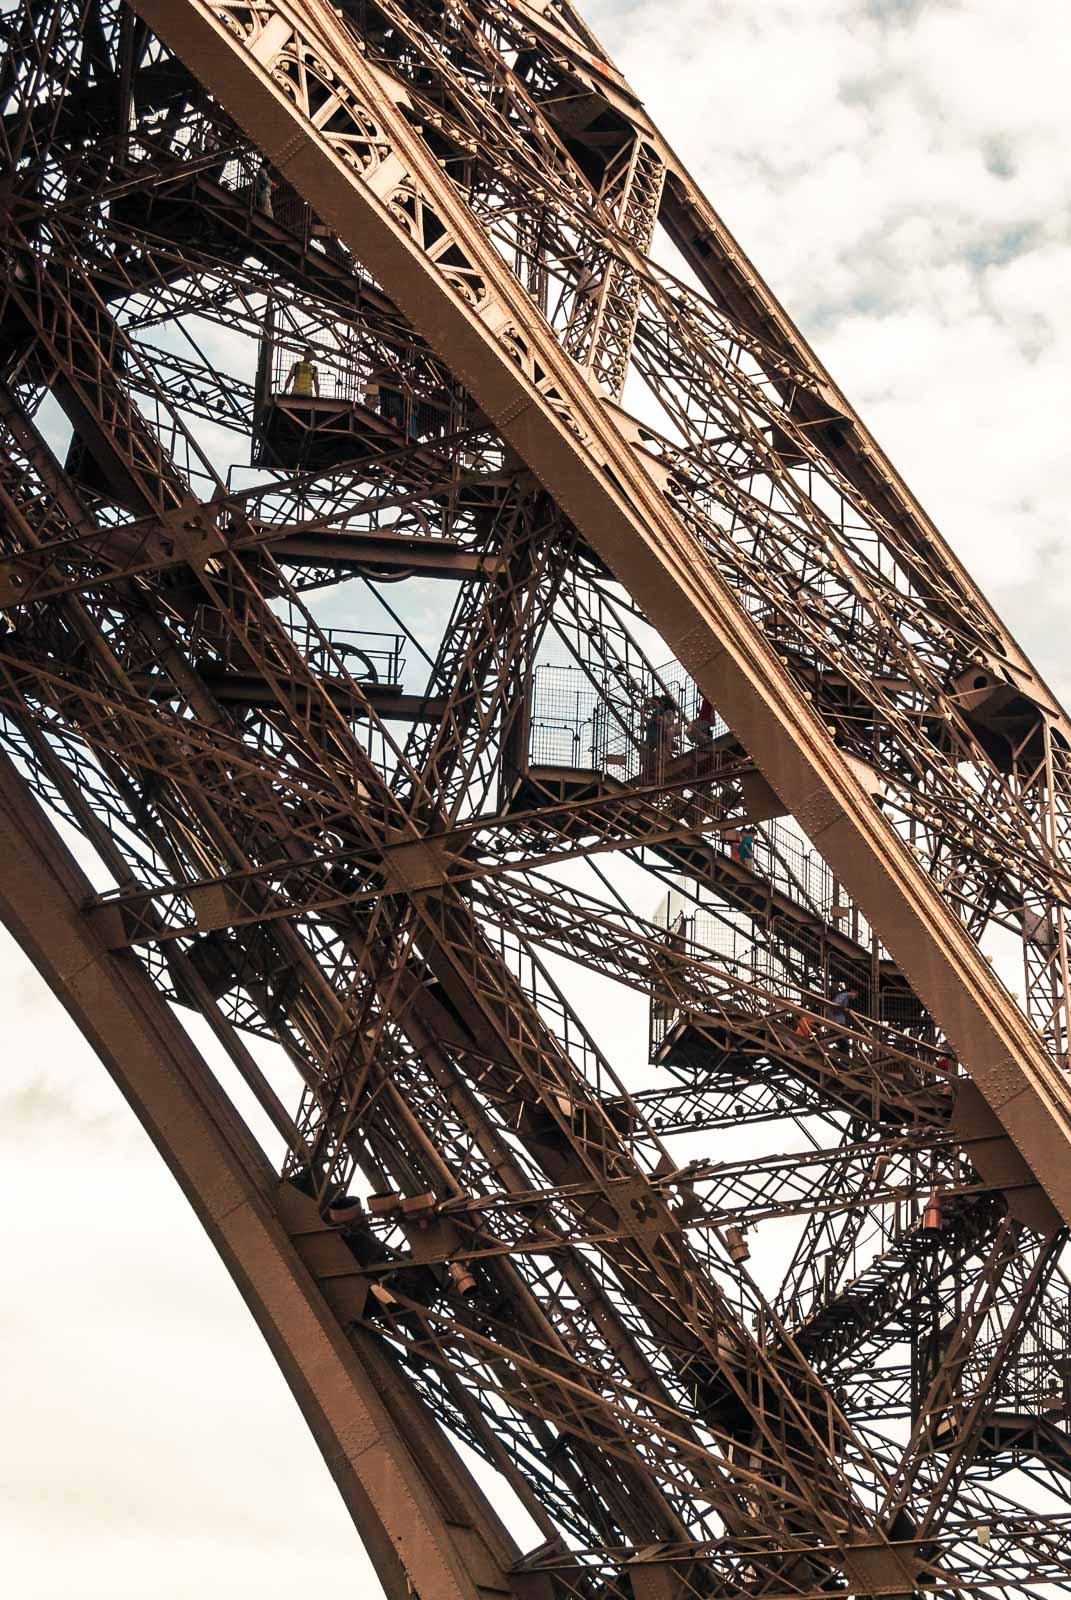 12_Paris-France-trip_Joseph-Barber-Photography.jpg